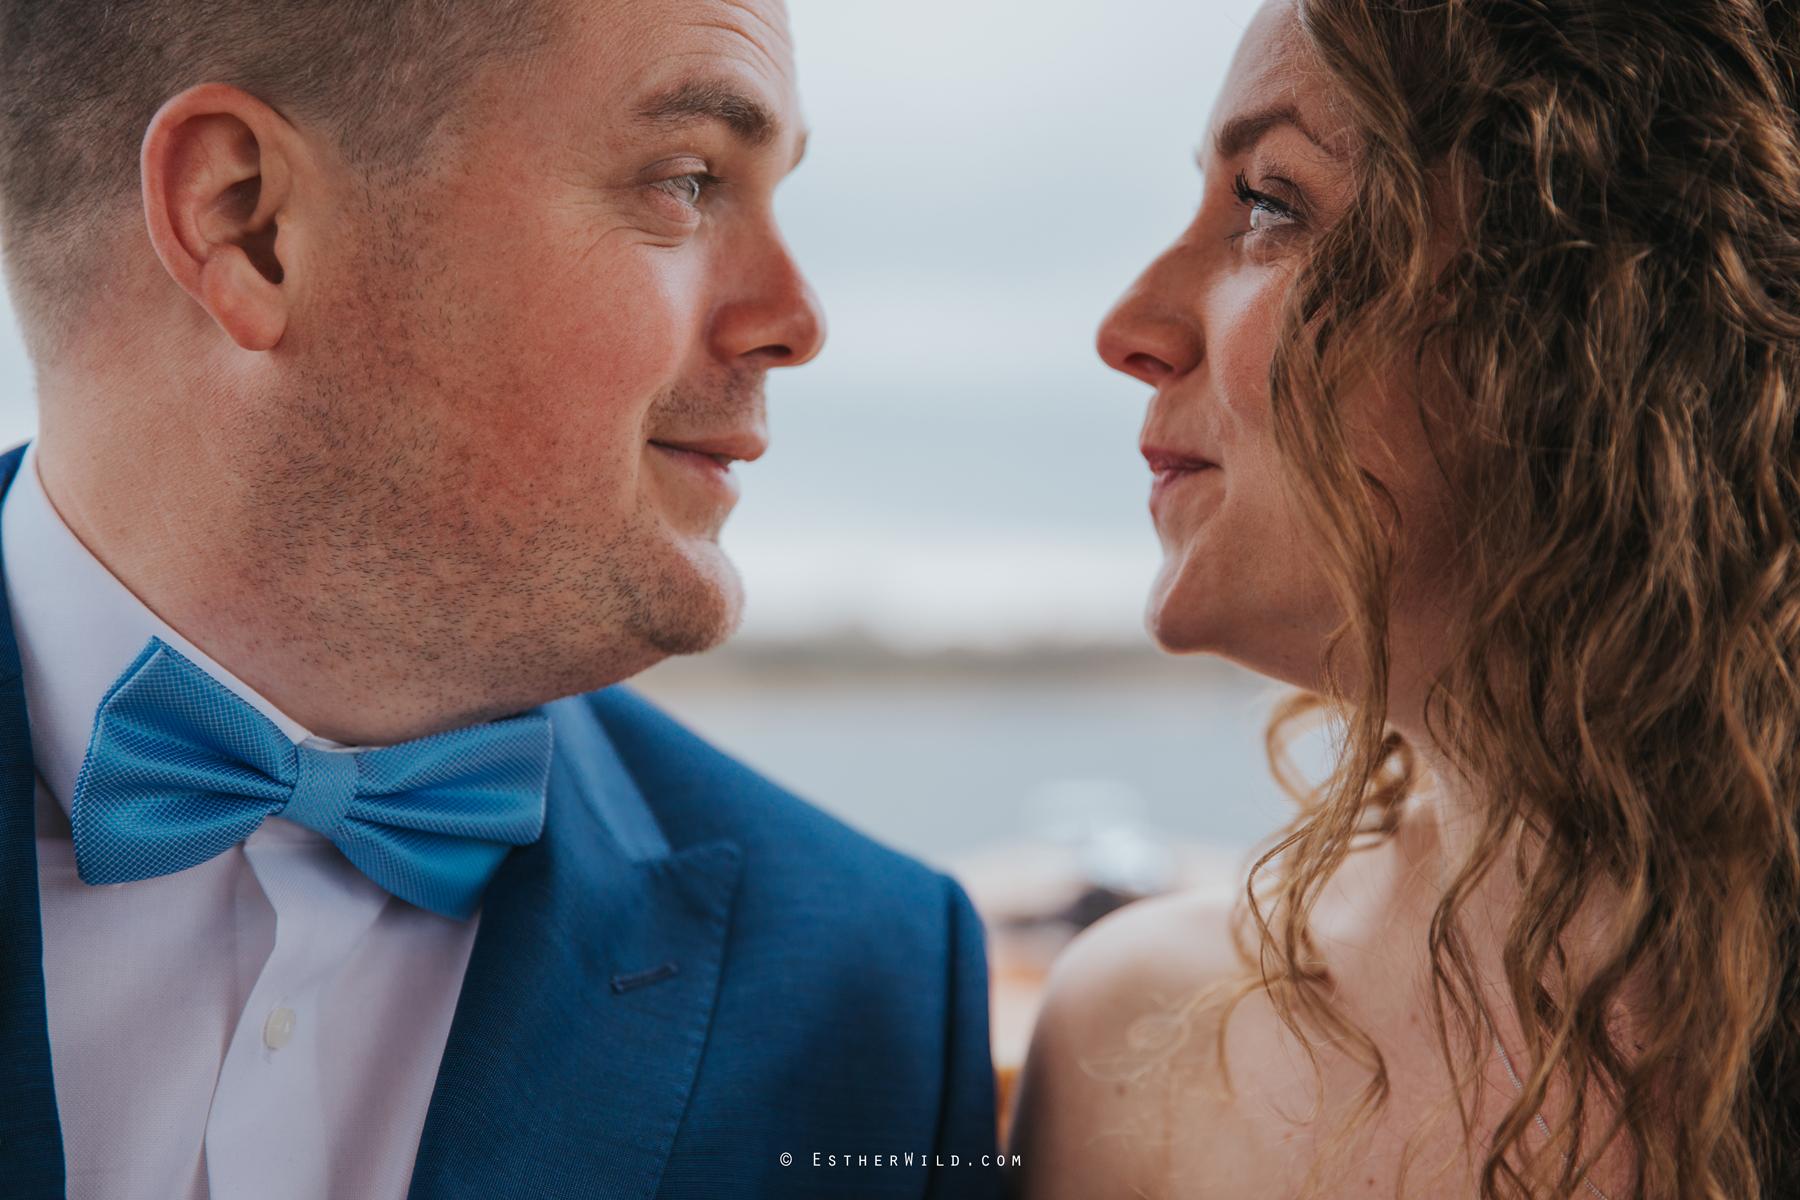 The_BoatHouse_Wedding_Venue_Ormesby_Norfolk_Broads_Boat_Wedding_Photography_Esther_Wild_Photographer_IMG_1523.jpg